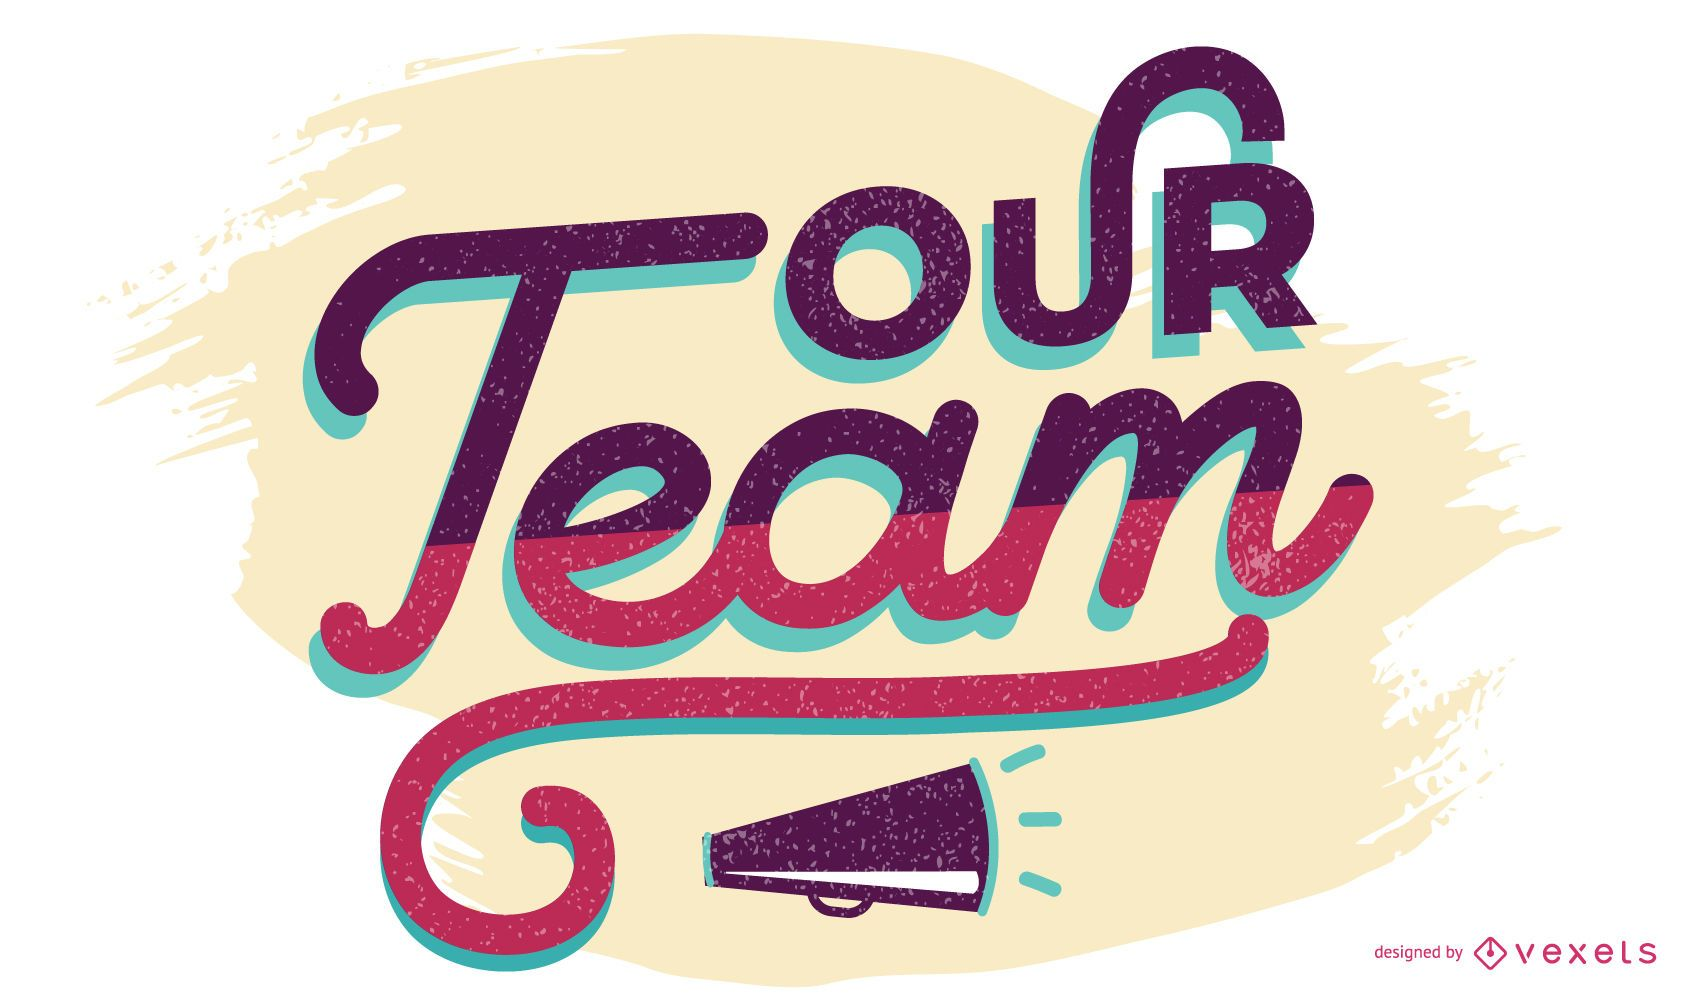 Our team lettering design